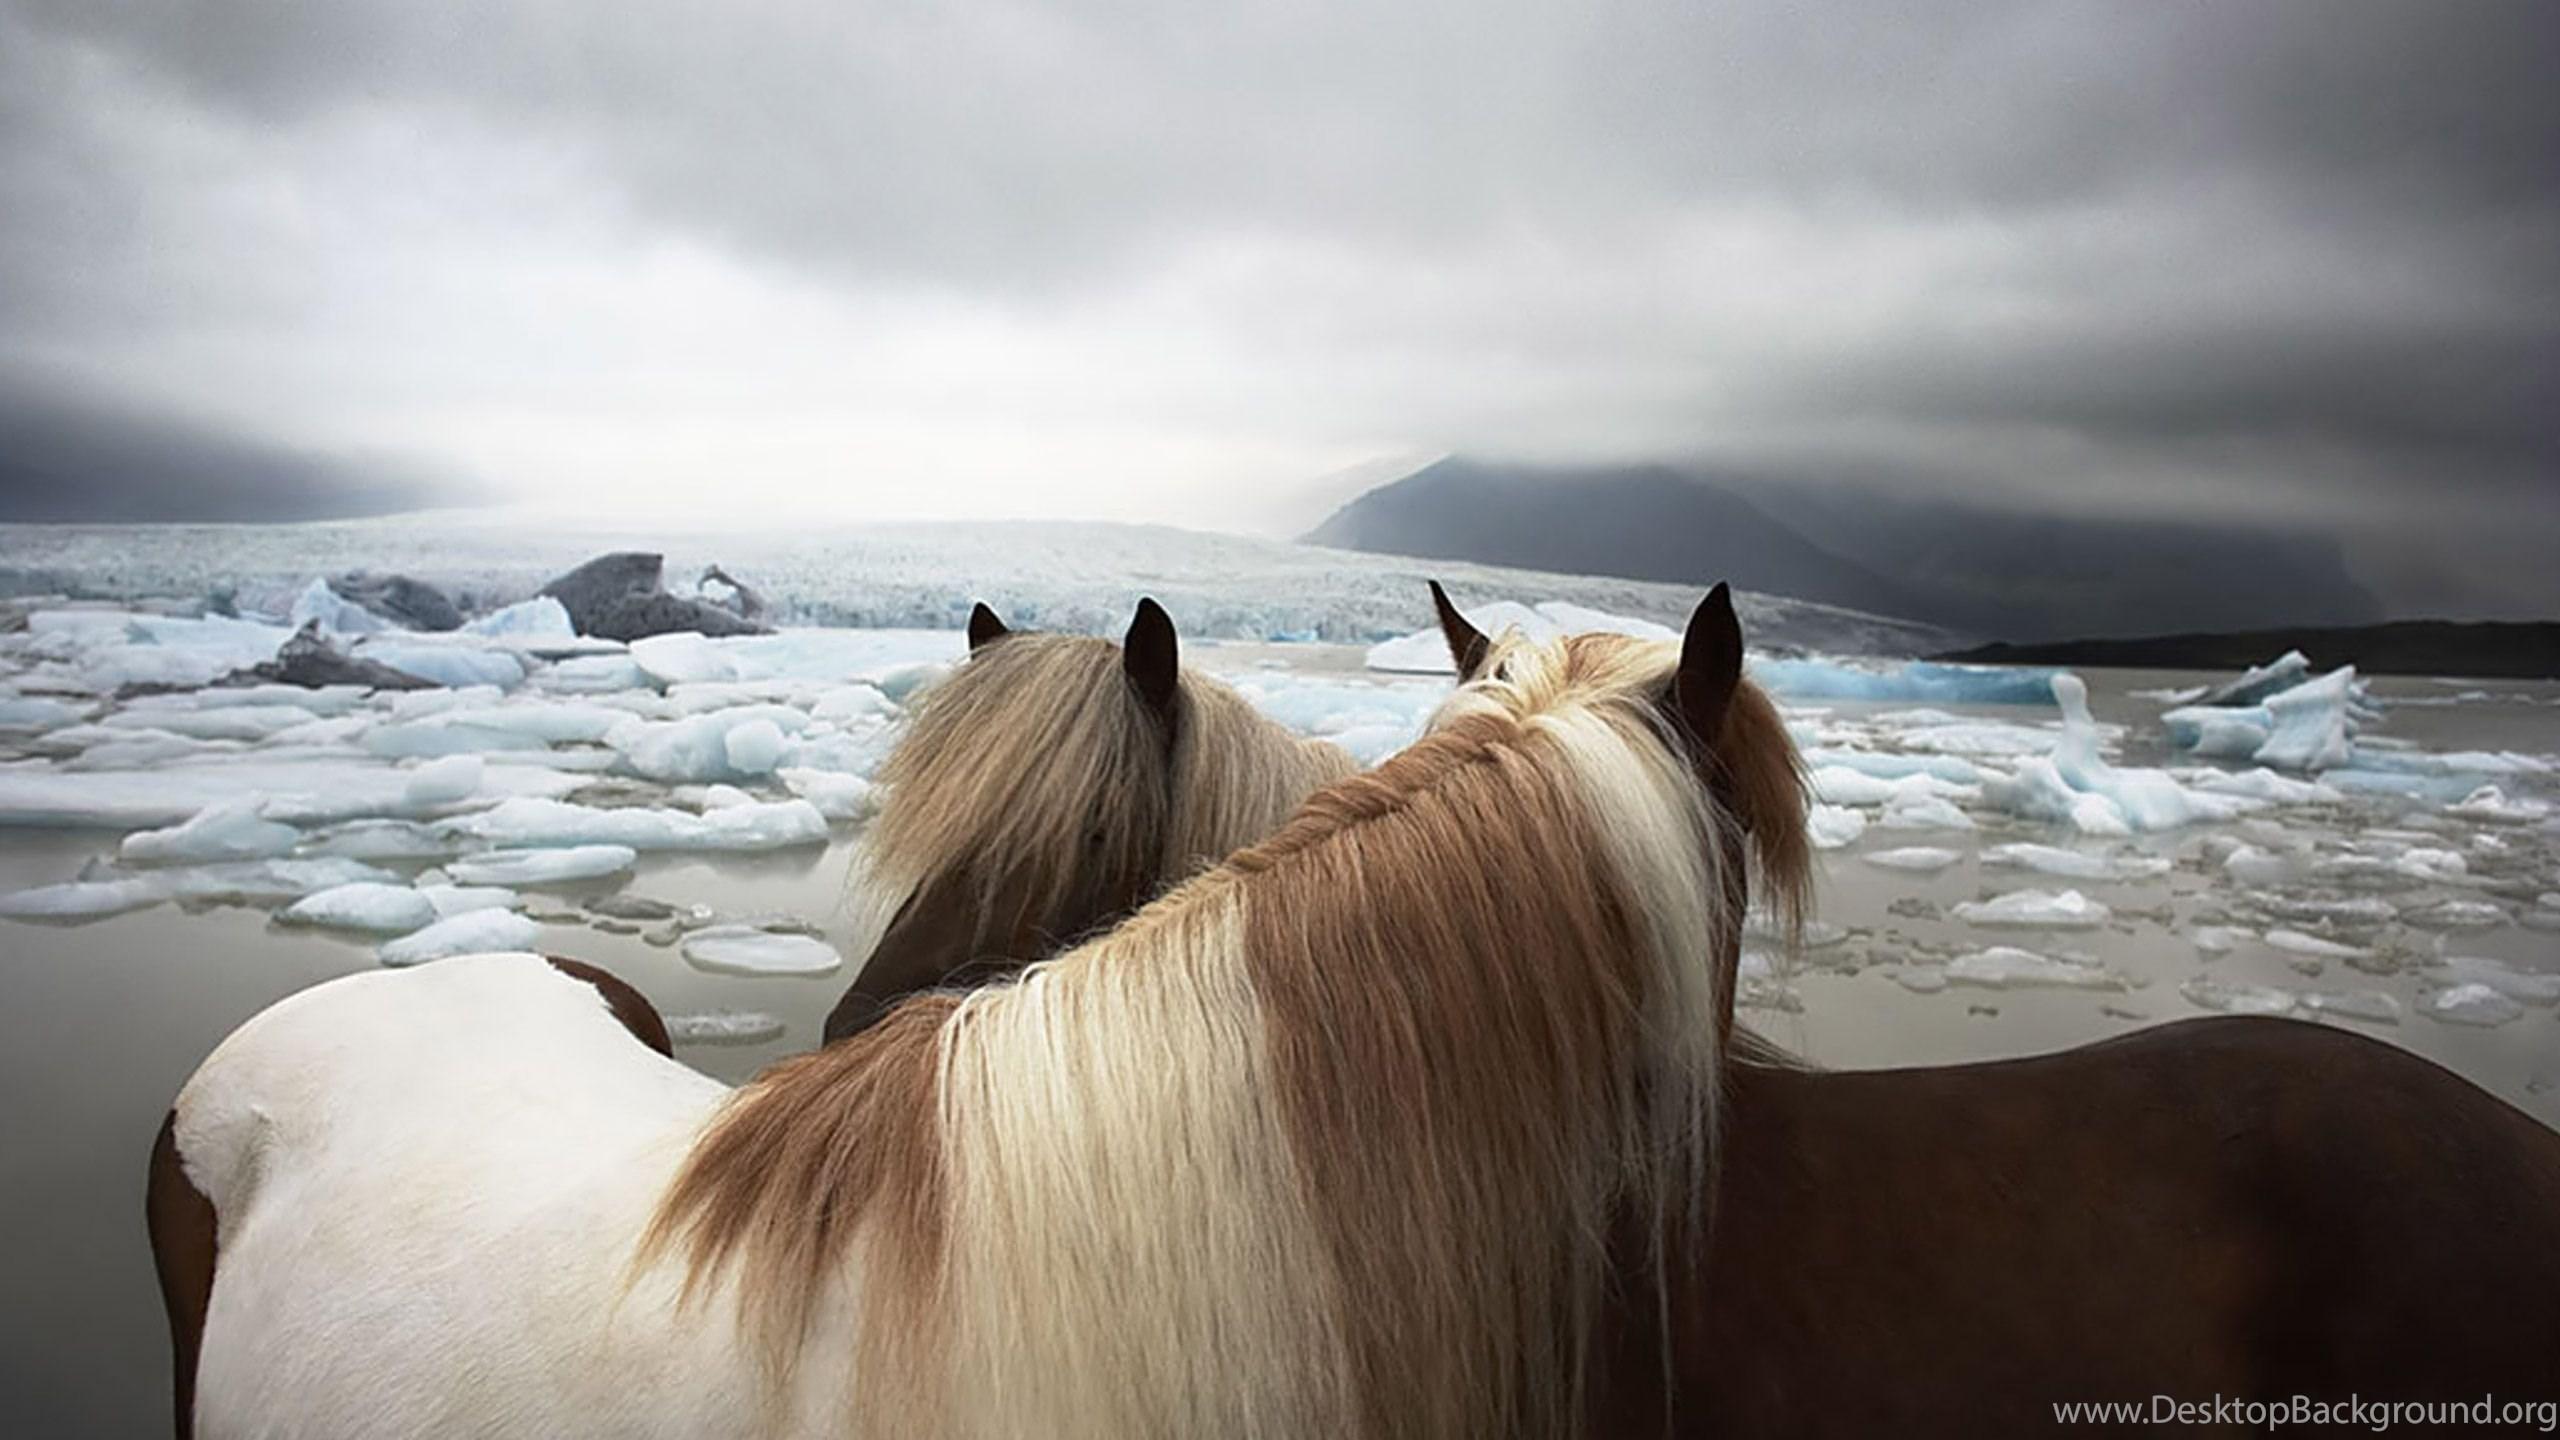 Desktop Wallpapers Gallery Windows 7 Horses Romantic Theme